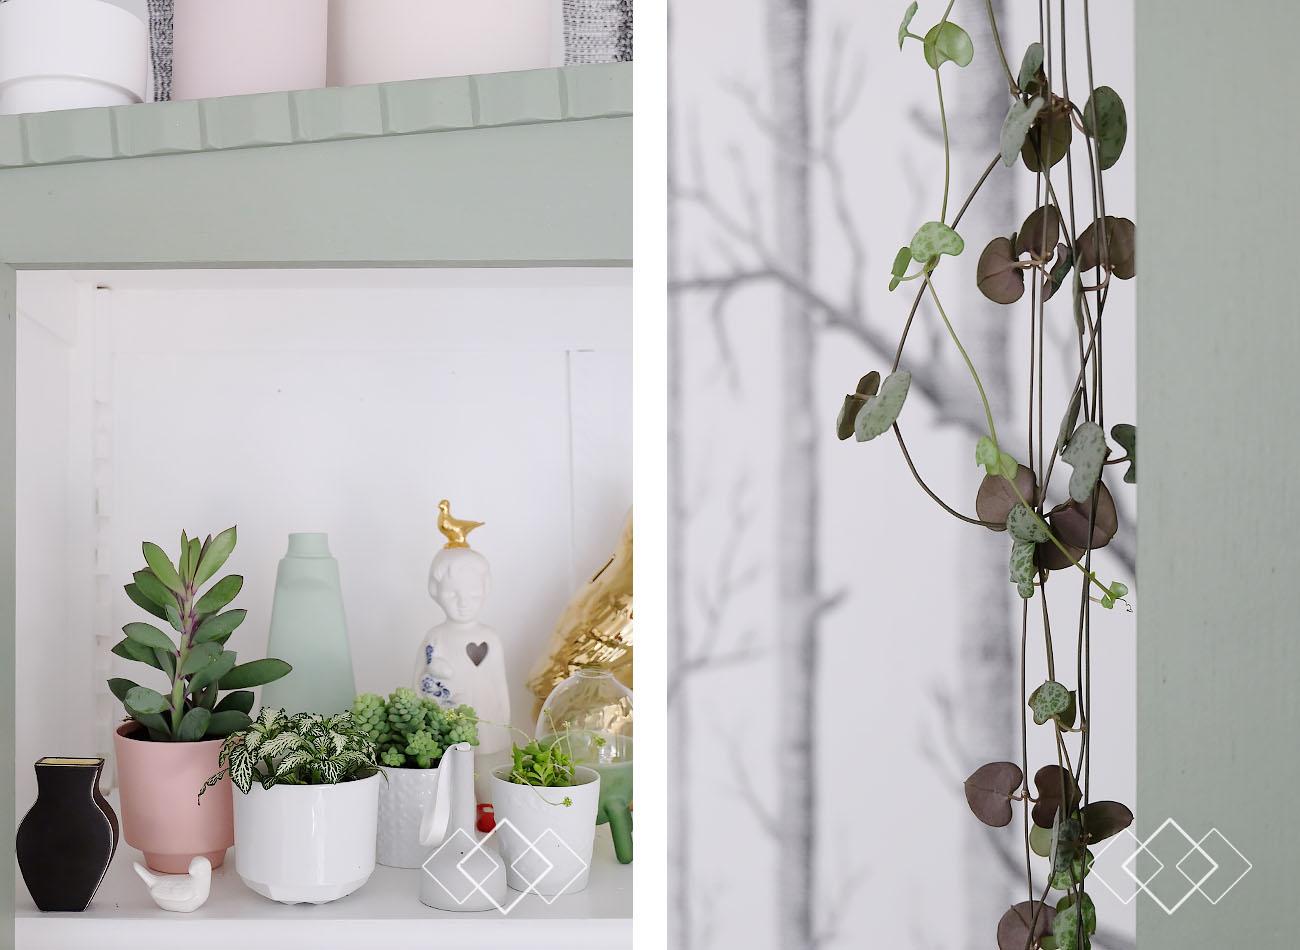 Plantjes 7 - staand